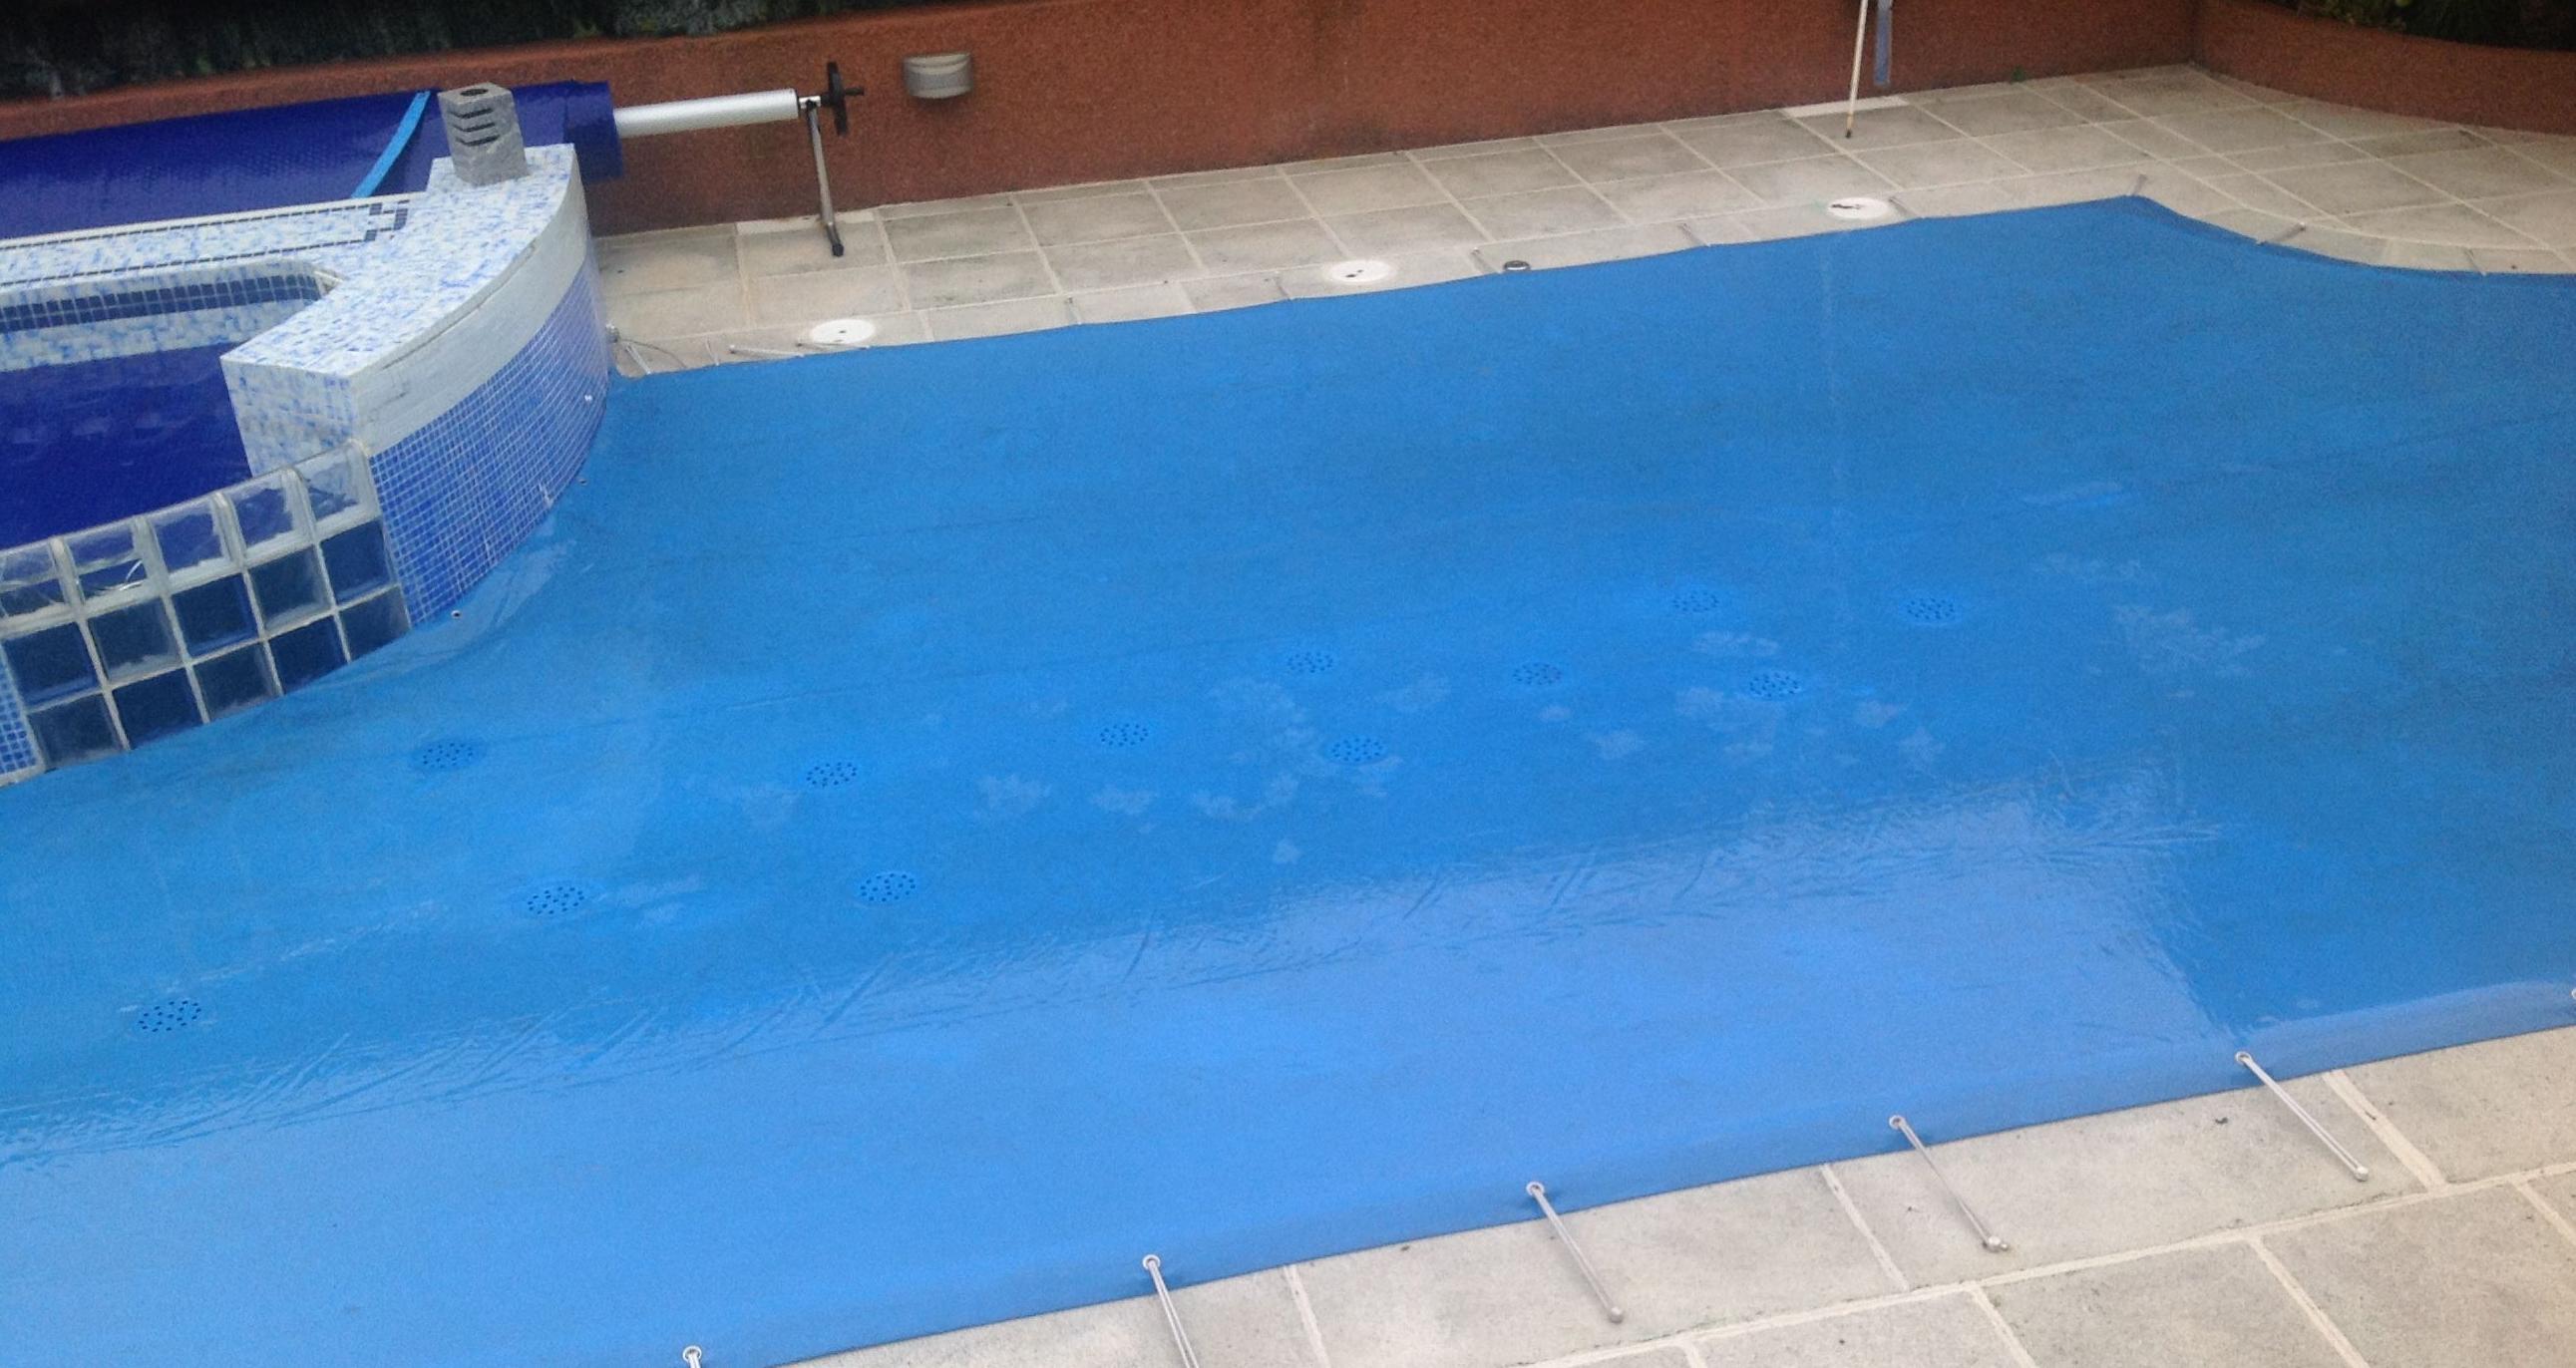 Cubiertas de protecci n de piscina cat logo de hidromatic rosell - Catalogo de piscinas ...